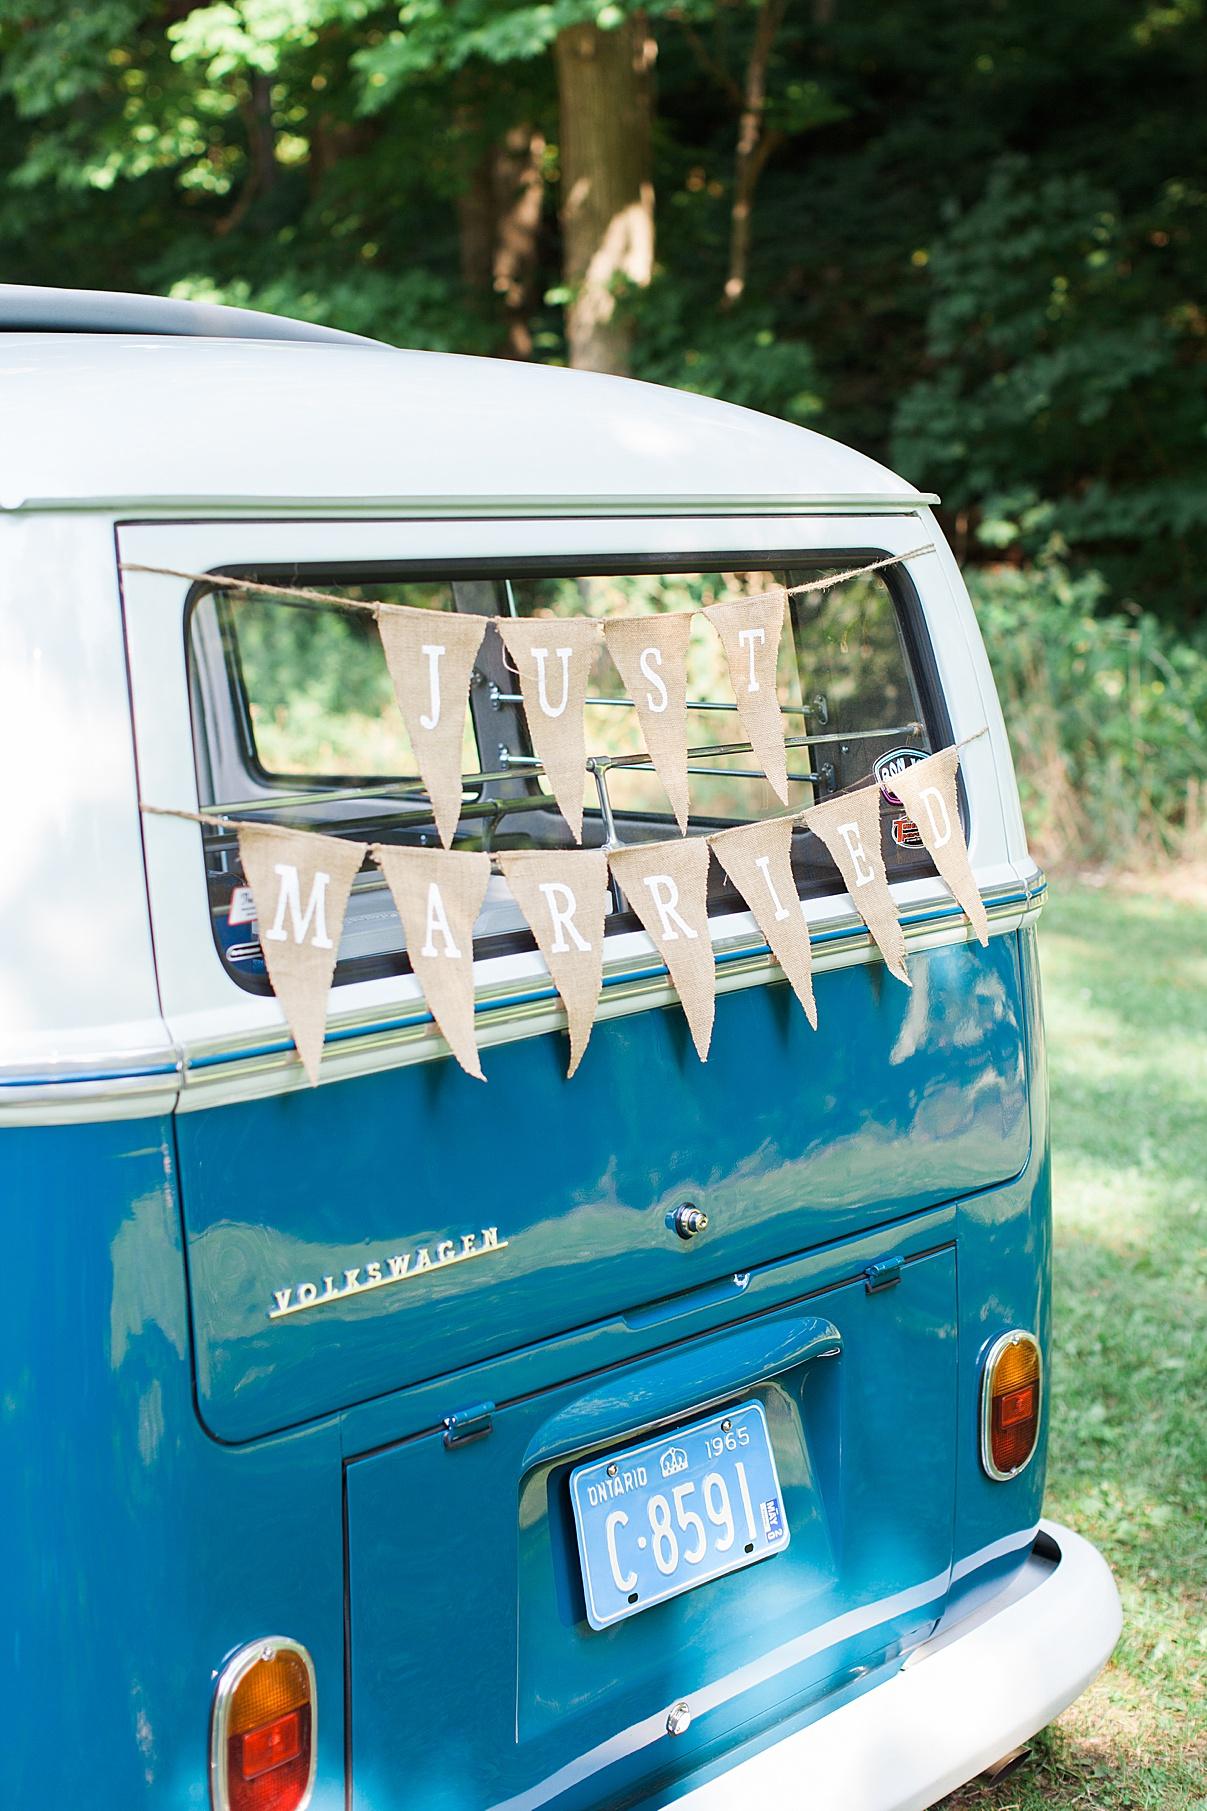 Just married getaway vehicle small vintage bus  Balls Falls, Ontario Wedding  Ontario Wedding Photographer  Toronto Wedding Photographer  3Photography  3photography.ca